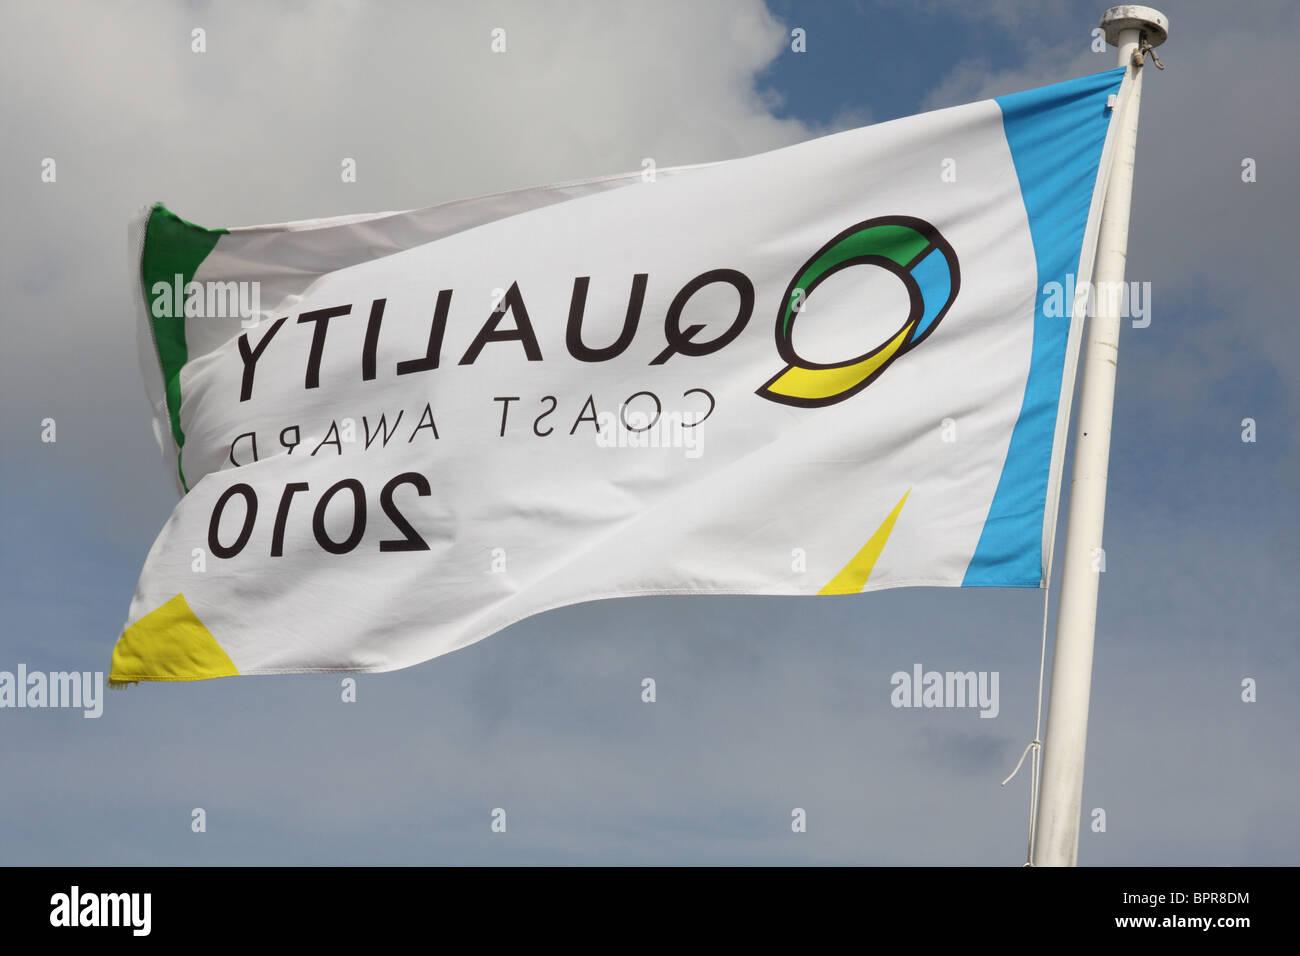 A Quality Coast  Award 2010 flag on a U.K. beach. - Stock Image